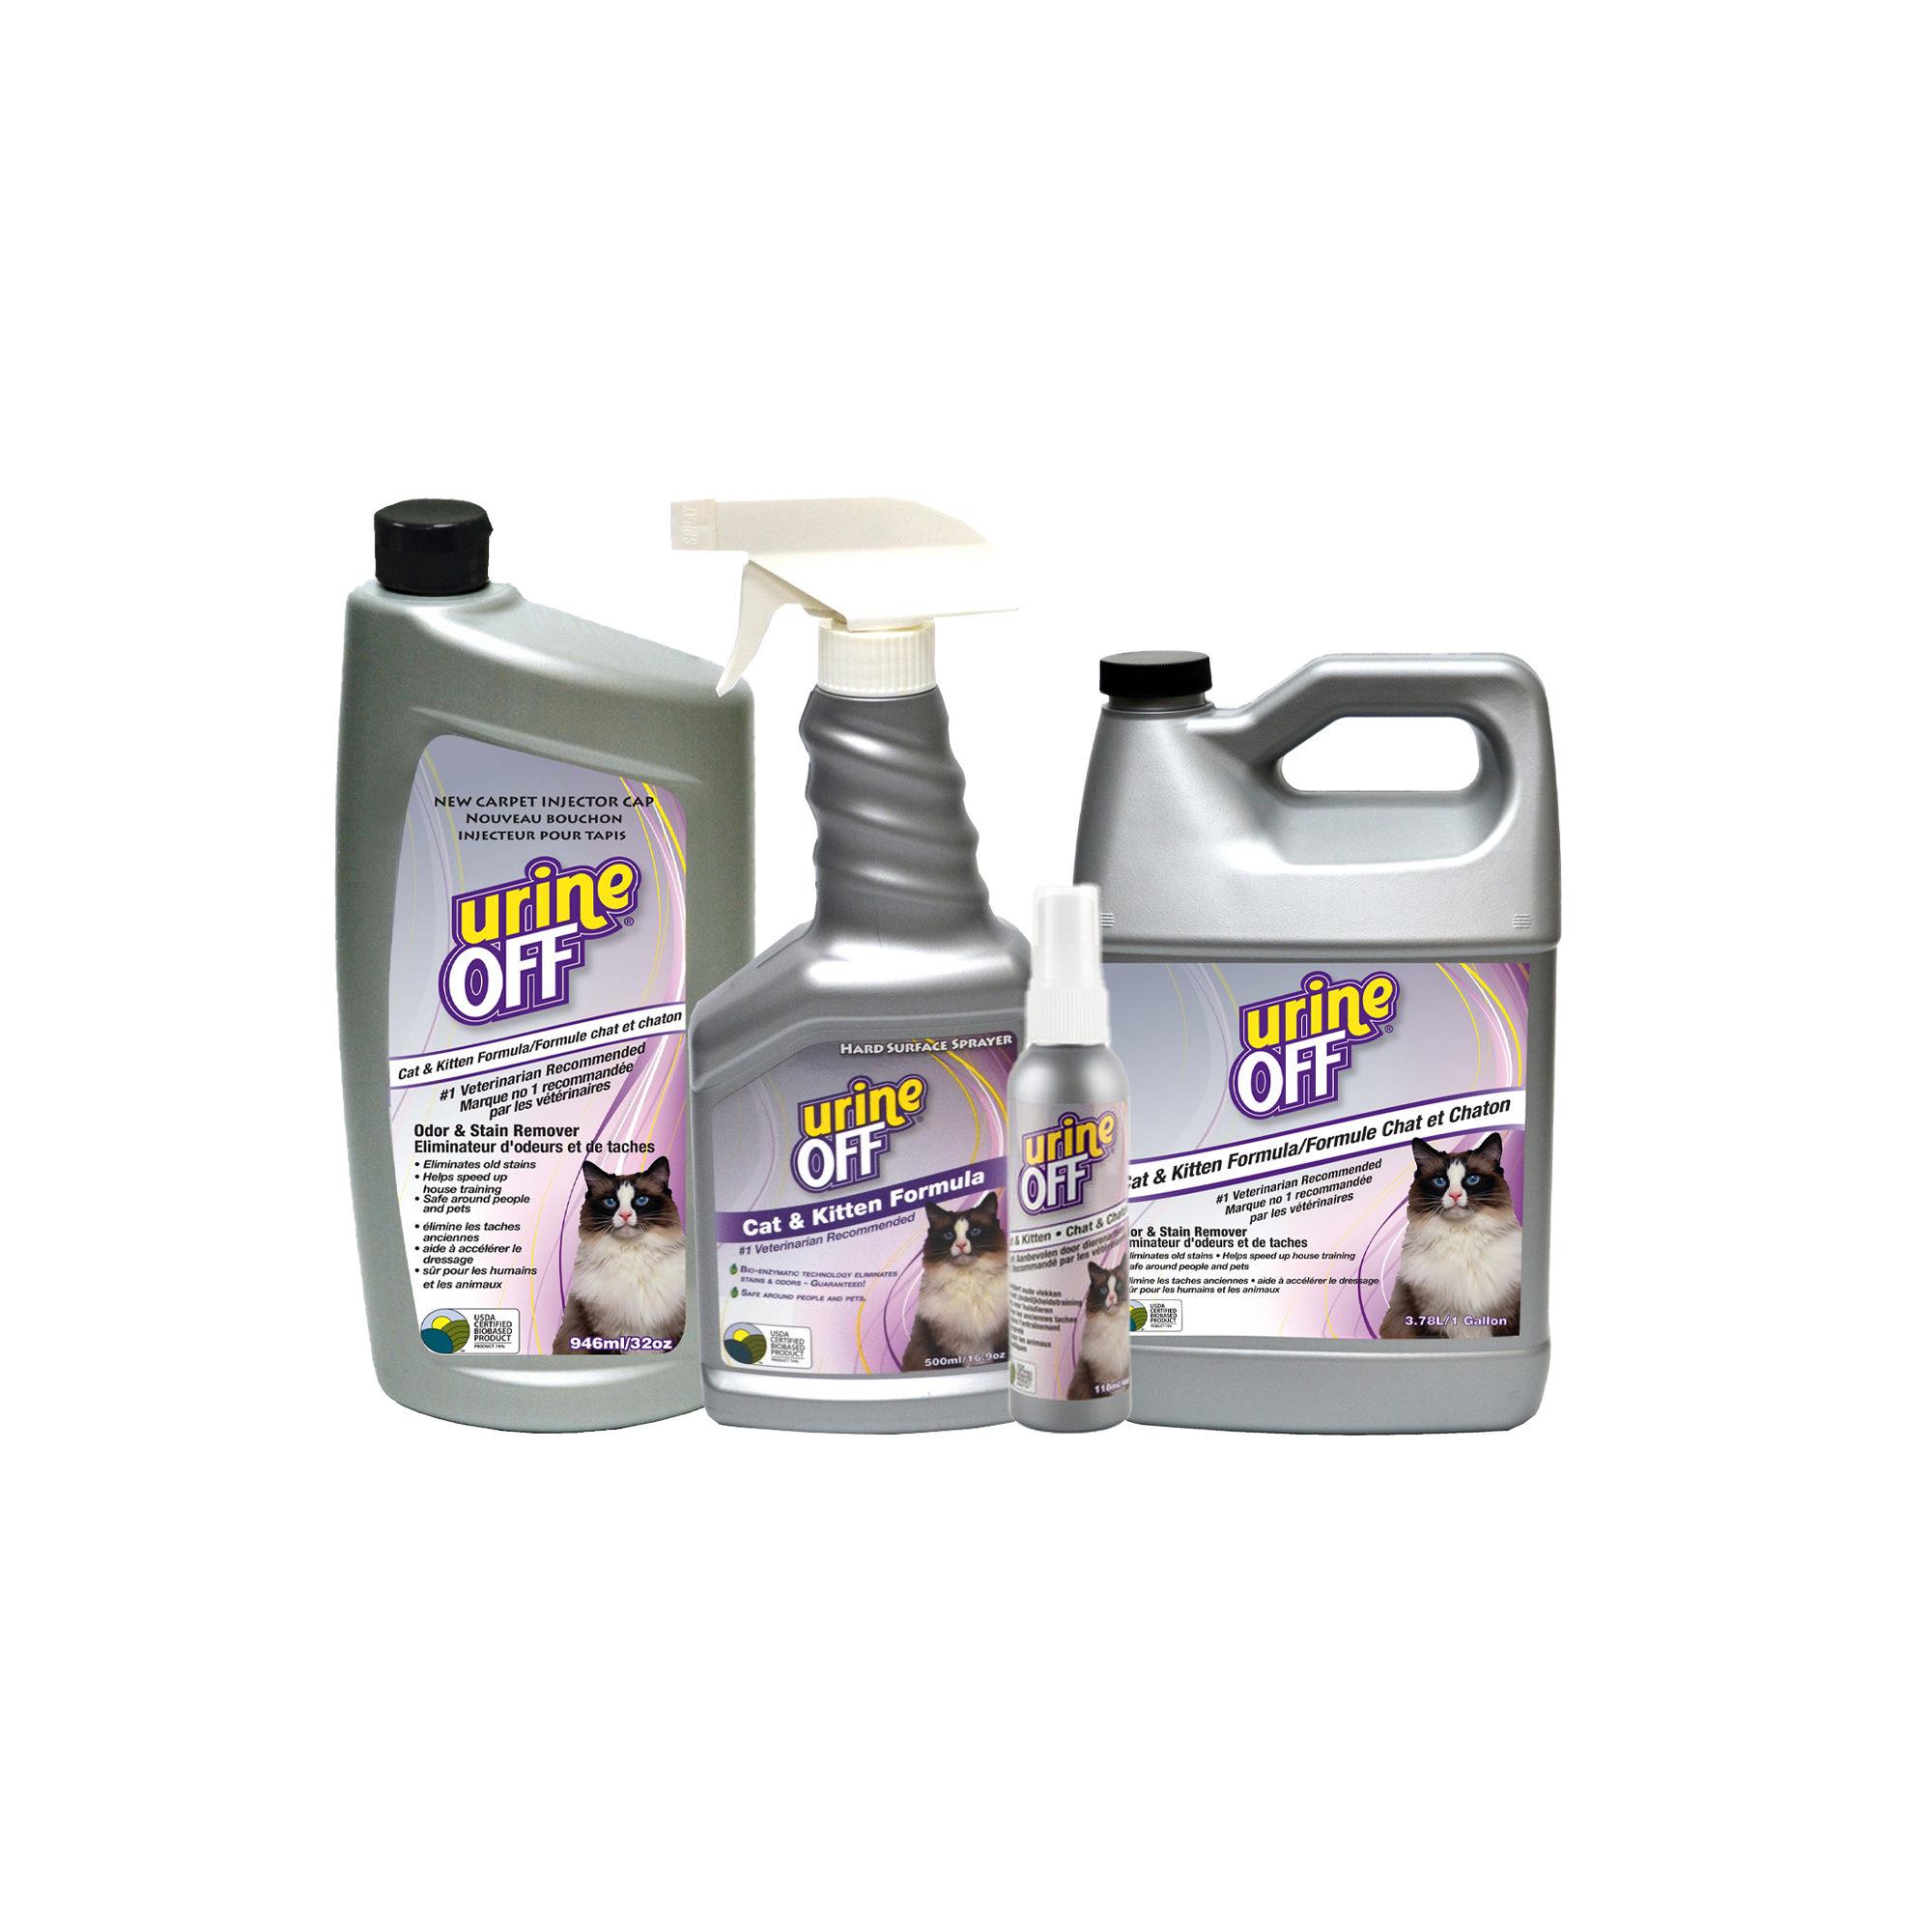 Urine-Off Katze & Kätzchen Refill